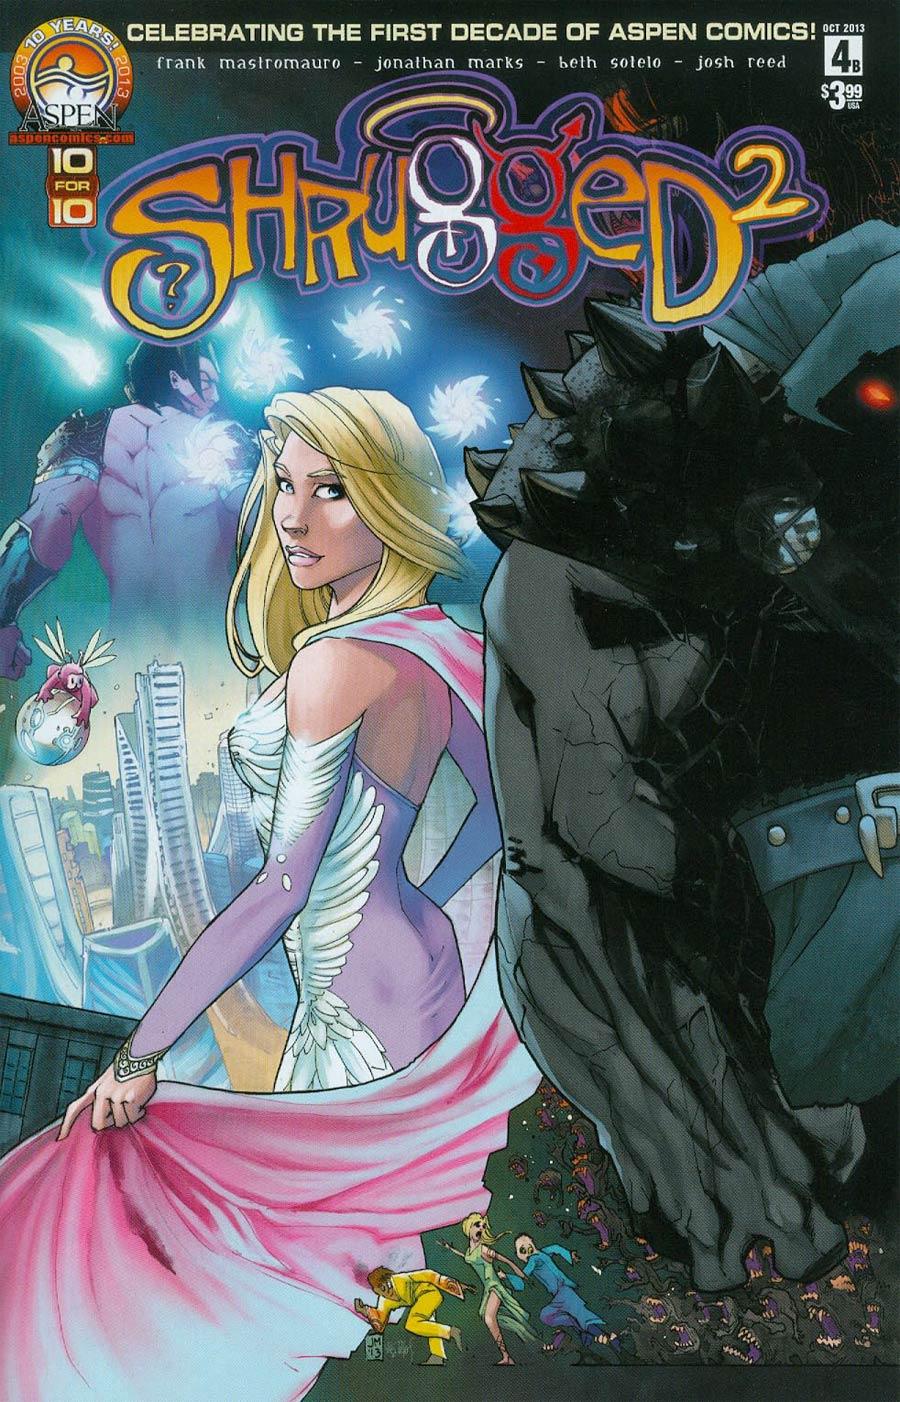 Shrugged Vol 2 #4 Cover B